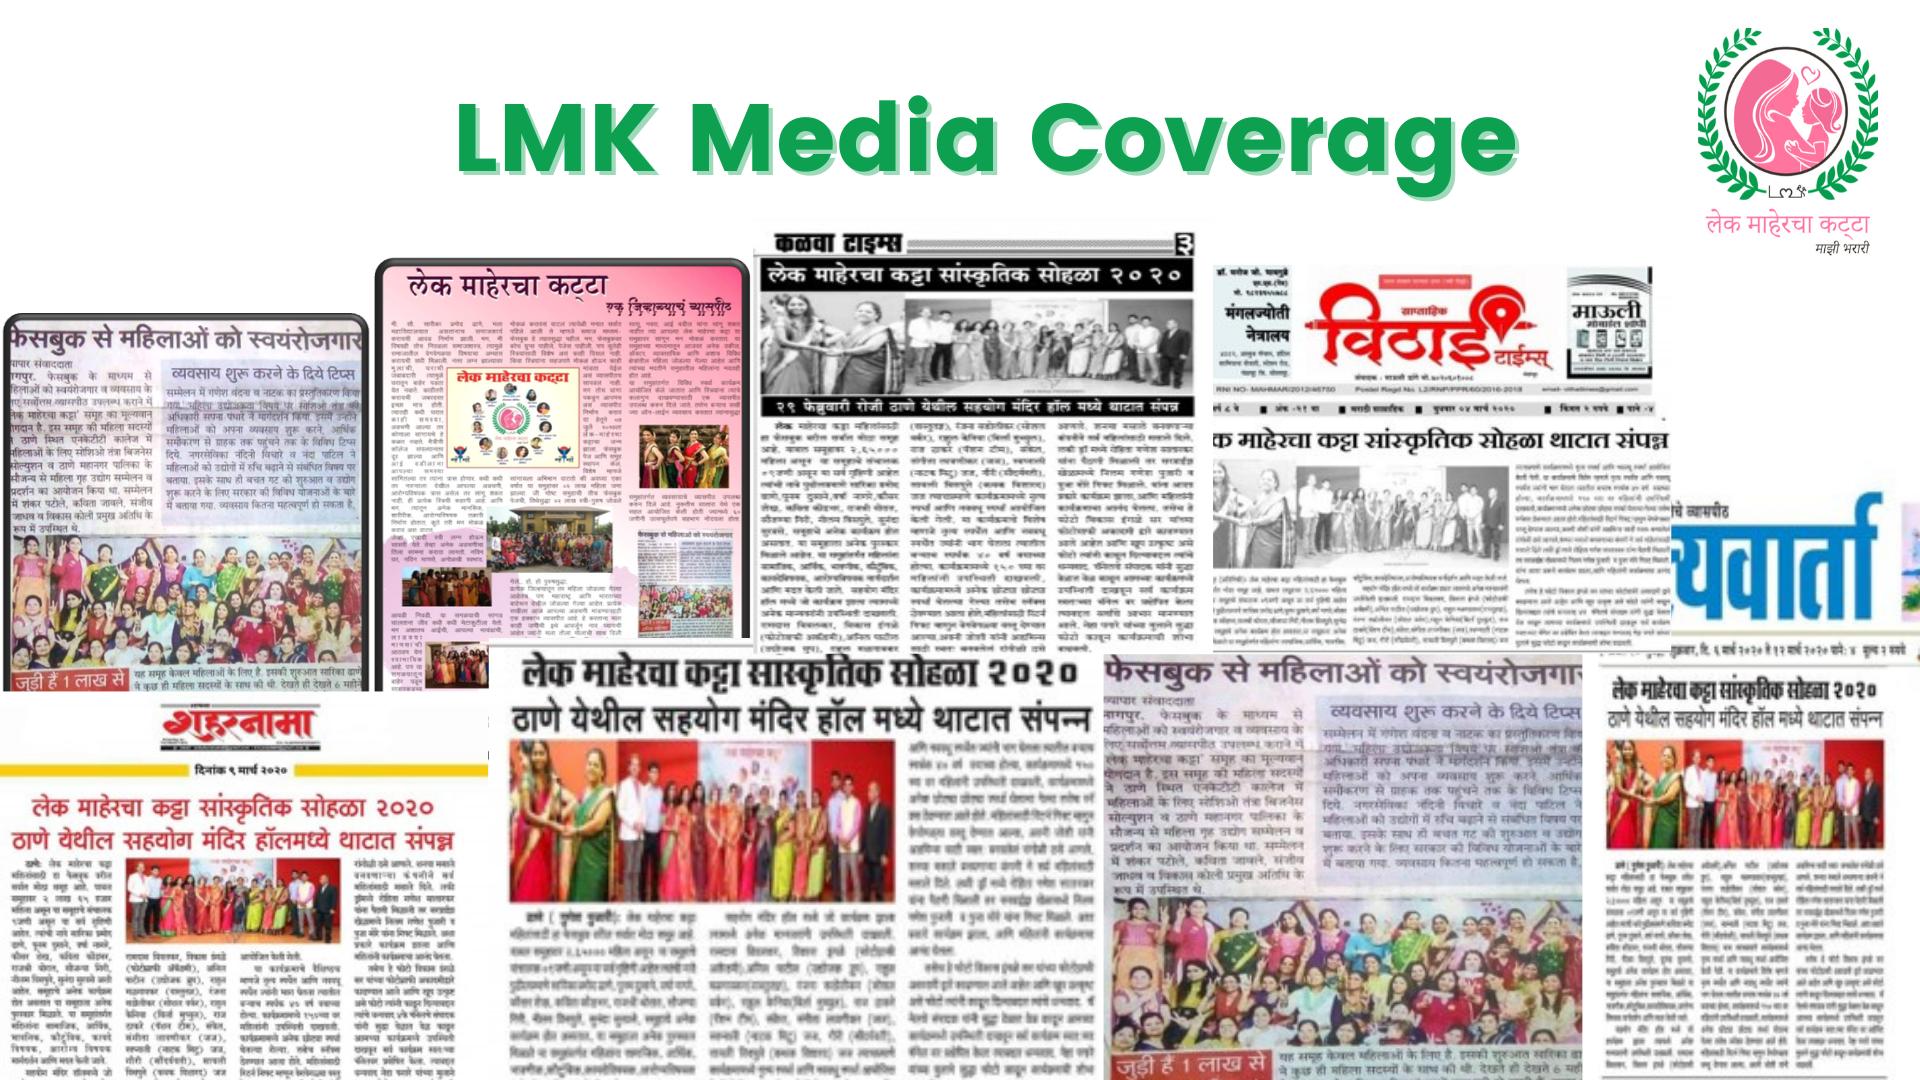 LMK Media Coverage- FB group admin success story